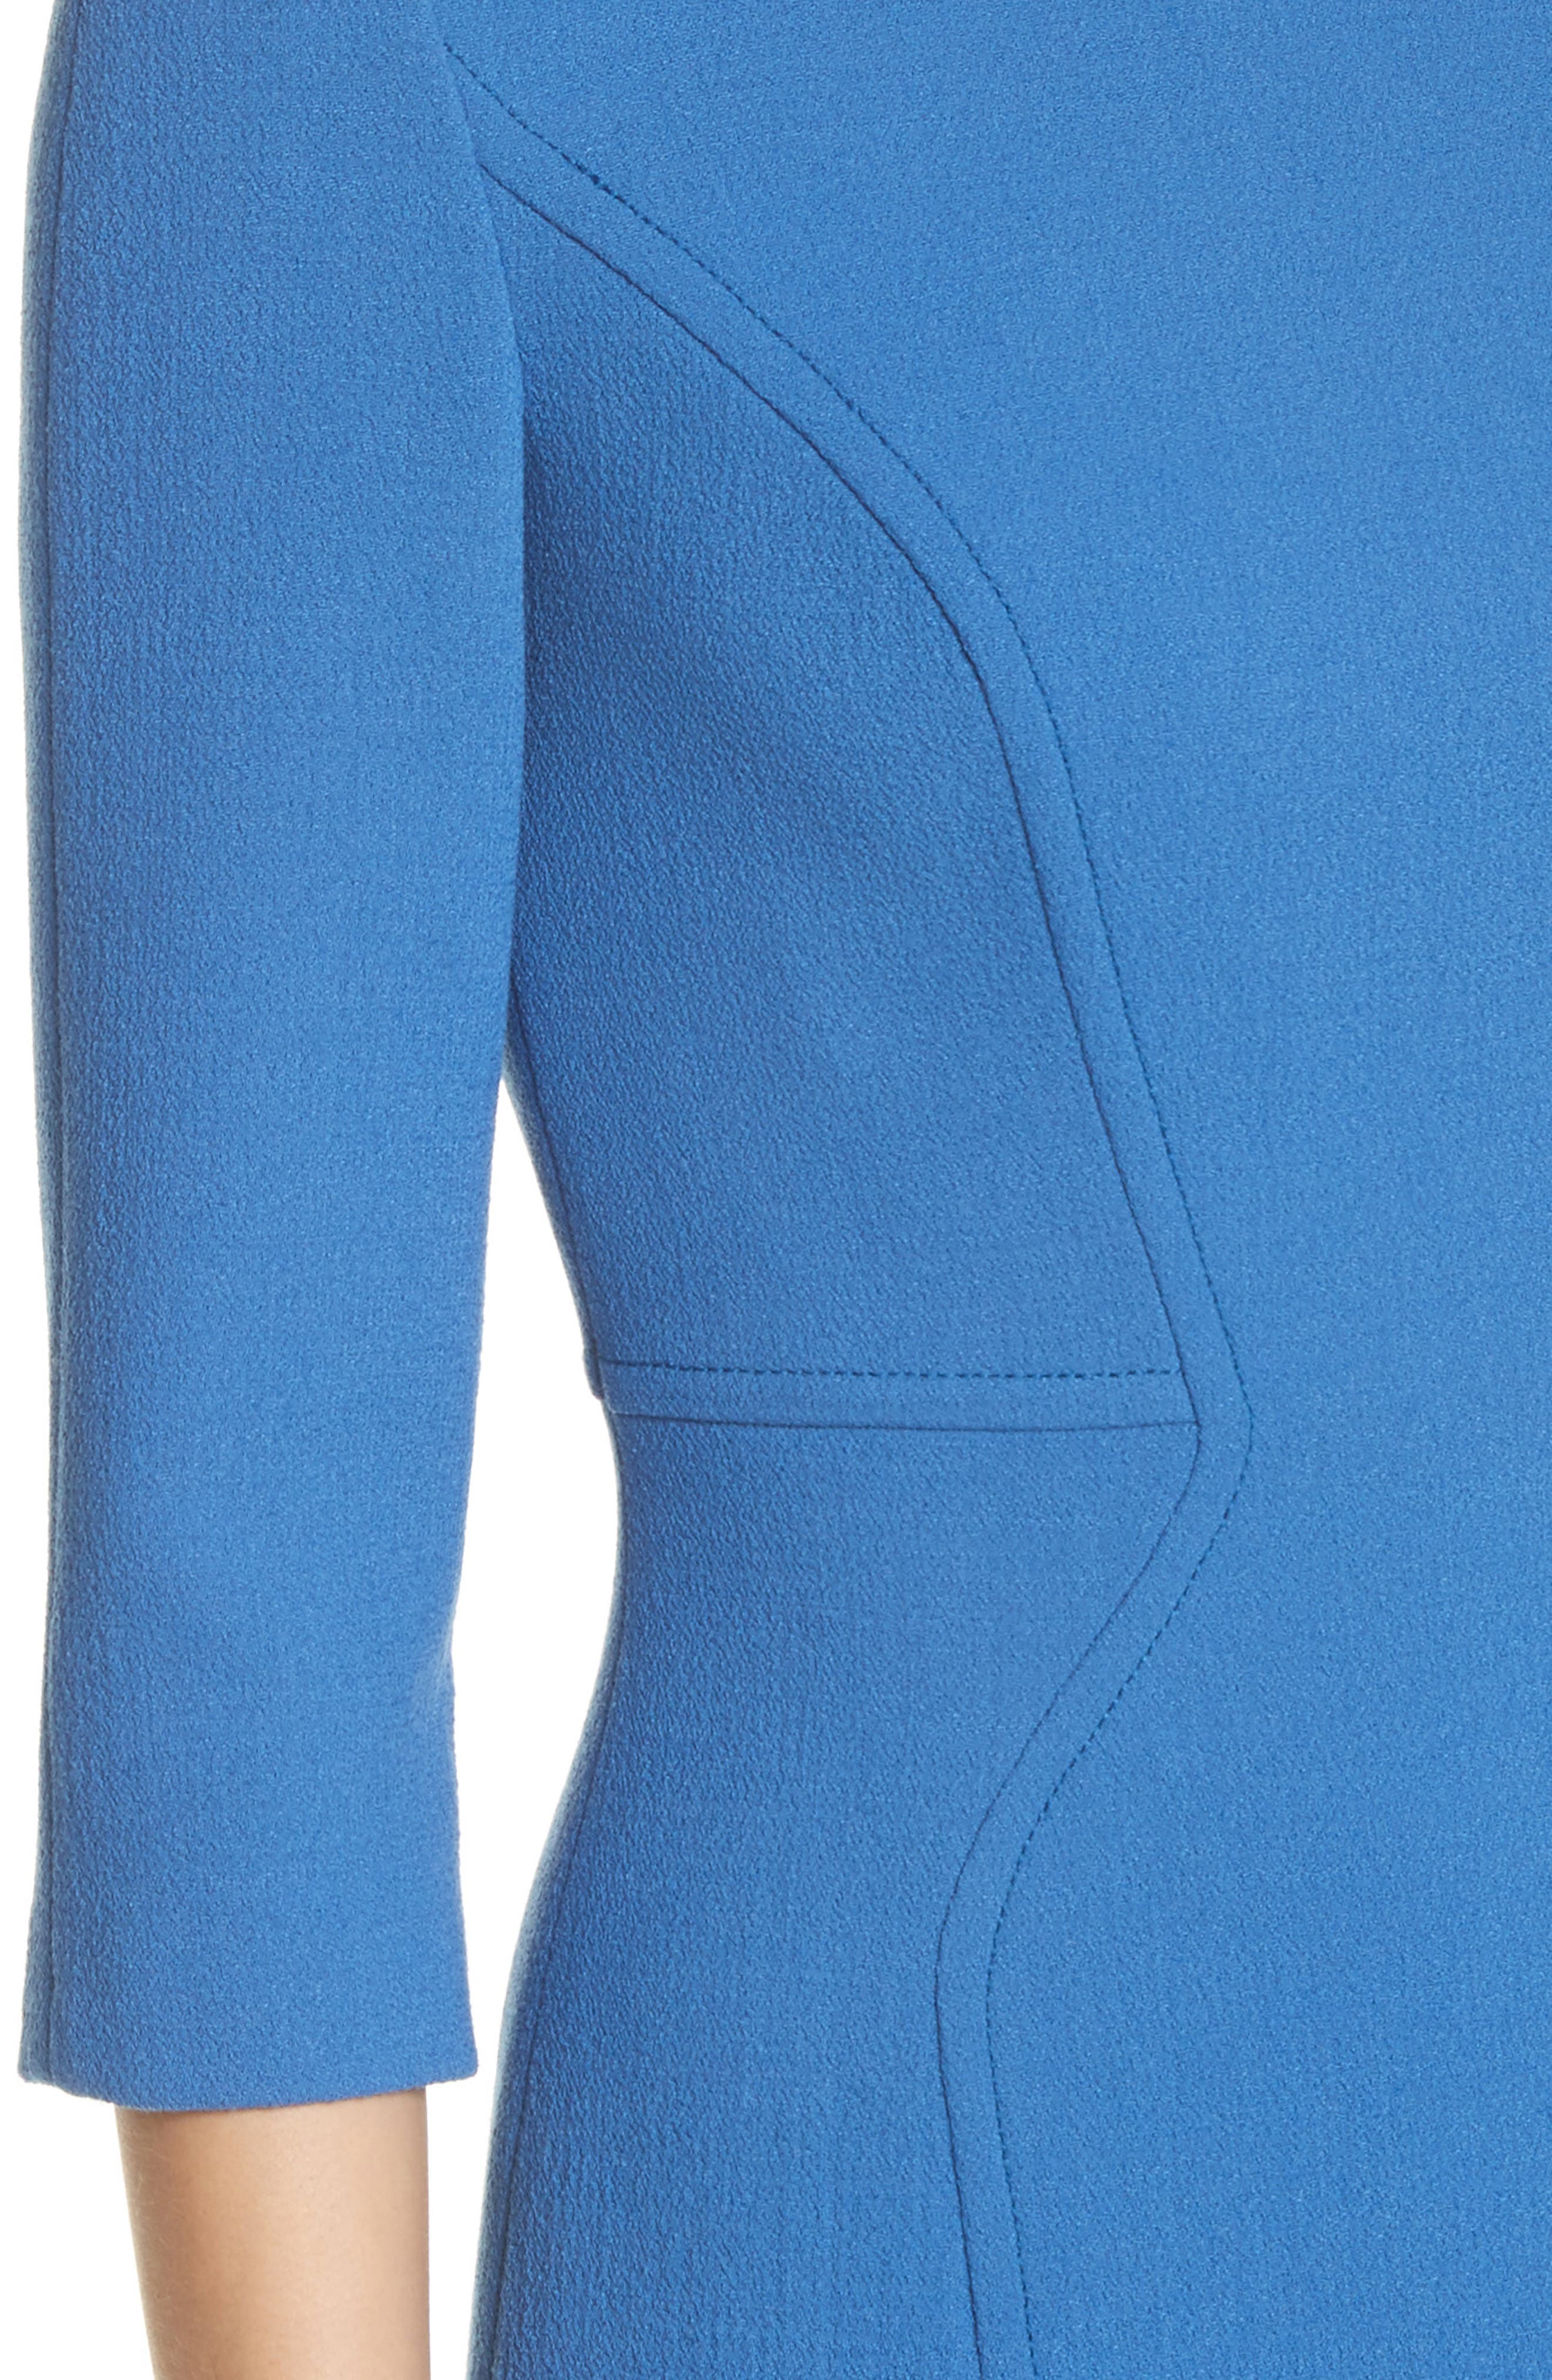 Stretch Wool Sheath Dress,                             Alternate thumbnail 4, color,